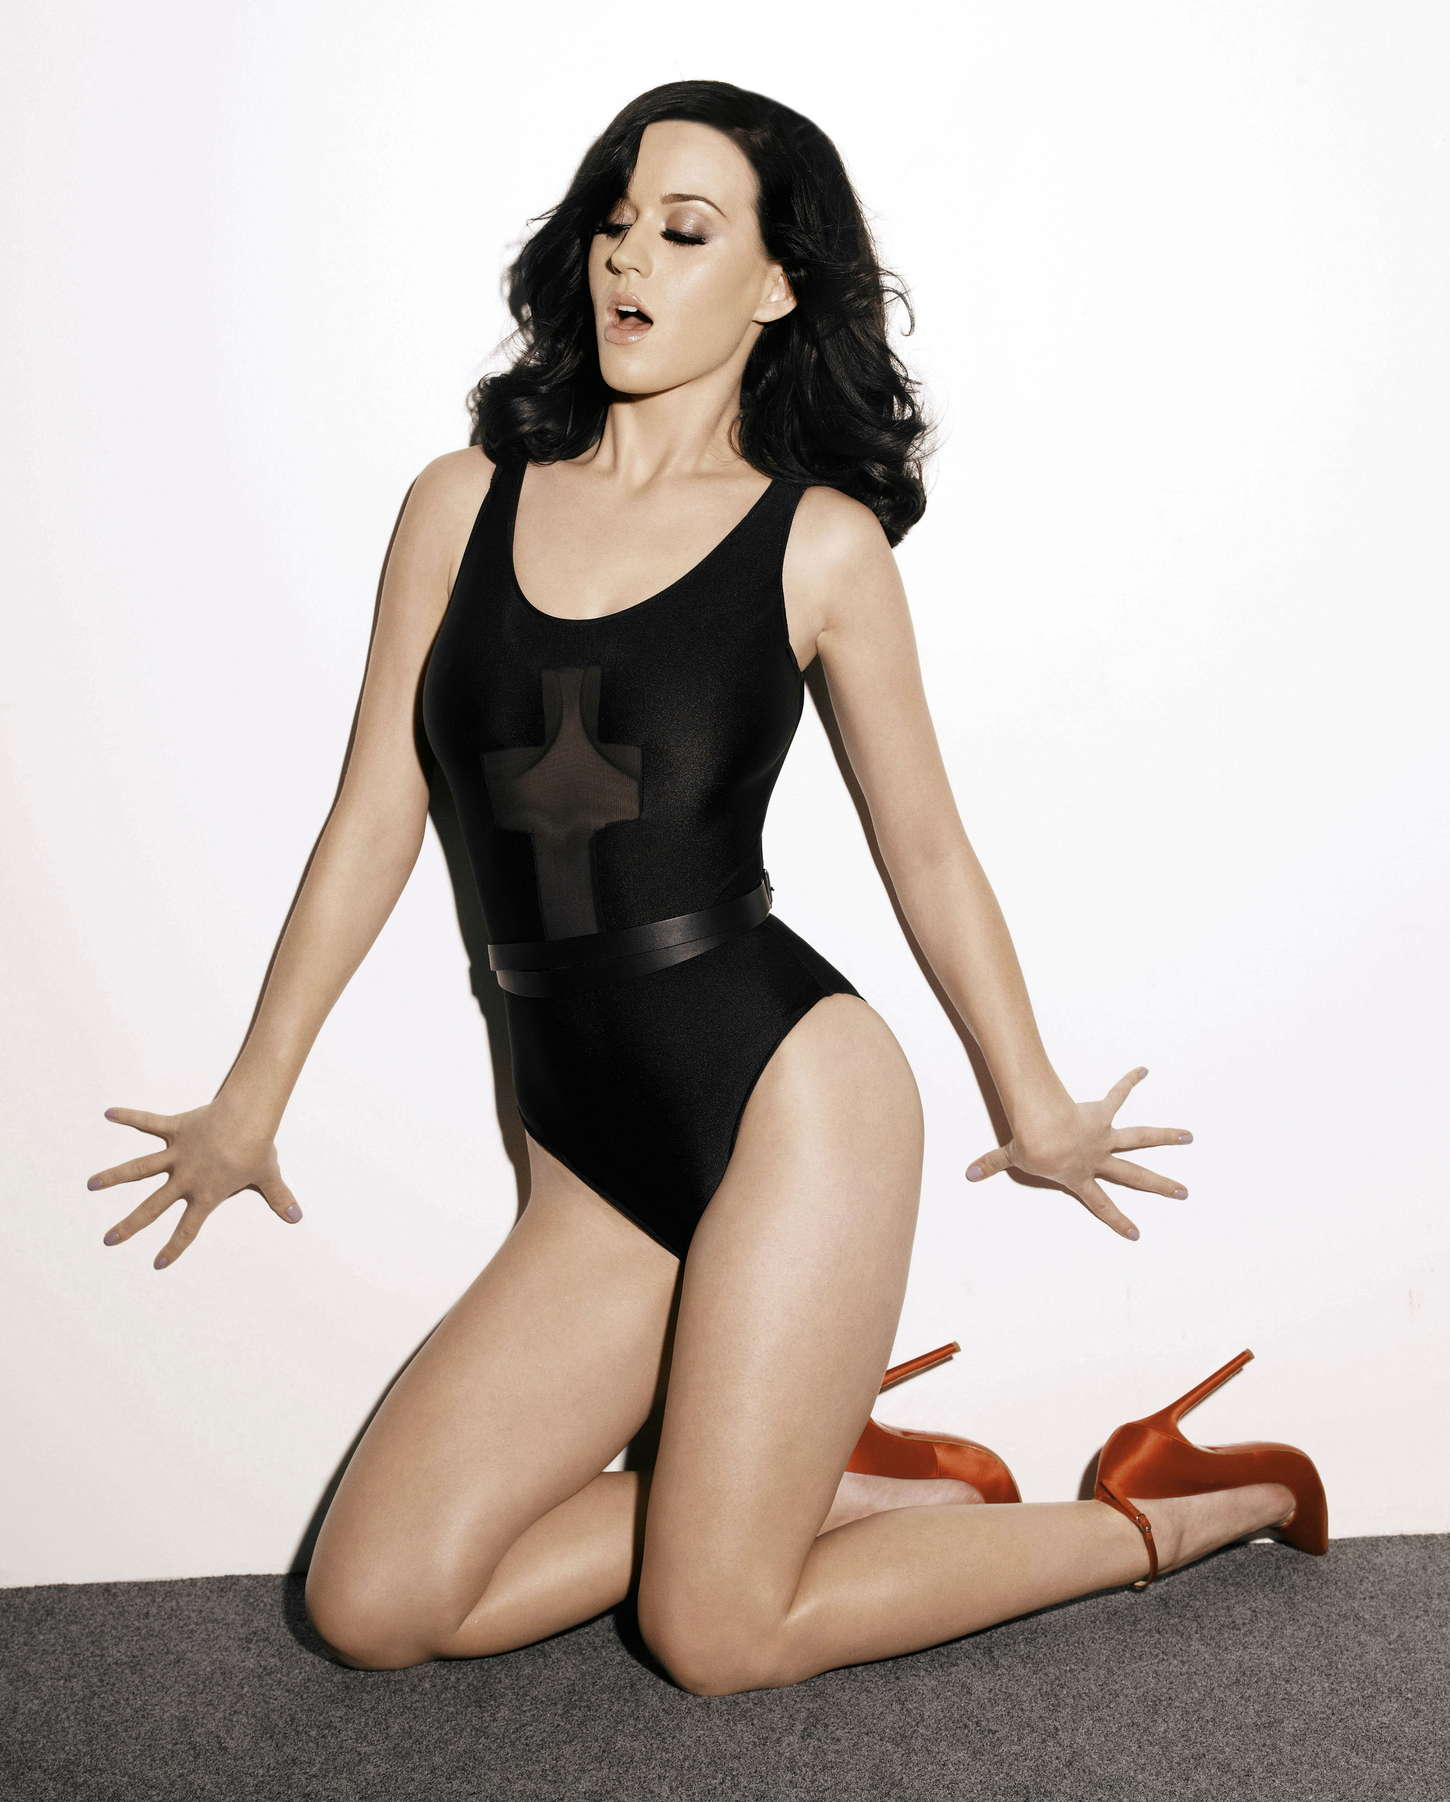 Katy Perry Hot Photoshoot -19 - GotCeleb